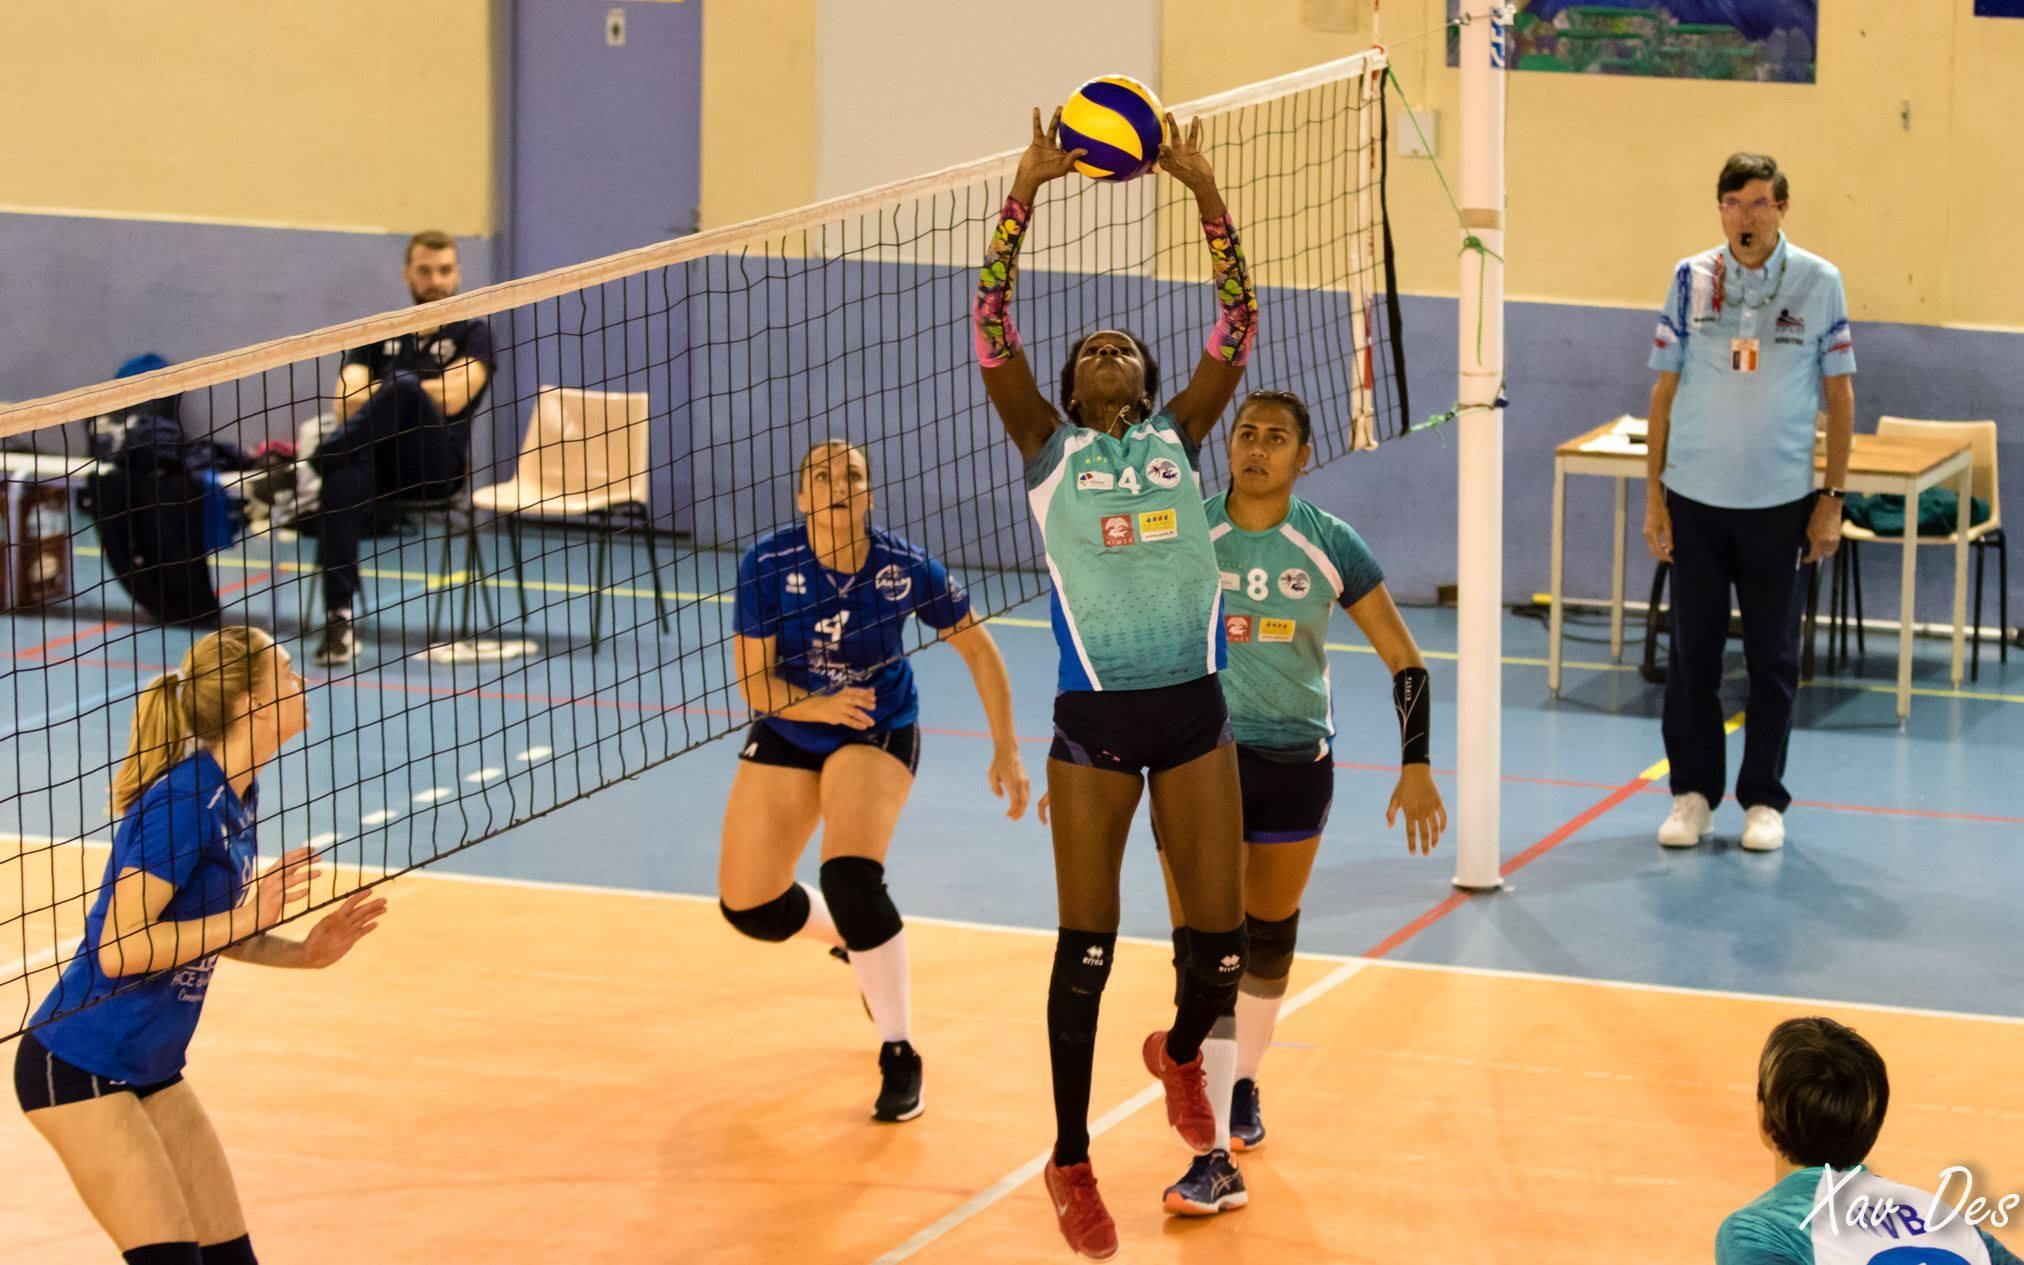 Aïta Gaye volley ball, match de Aïta Gaye, photos de Aïta Gaye, volley-ball